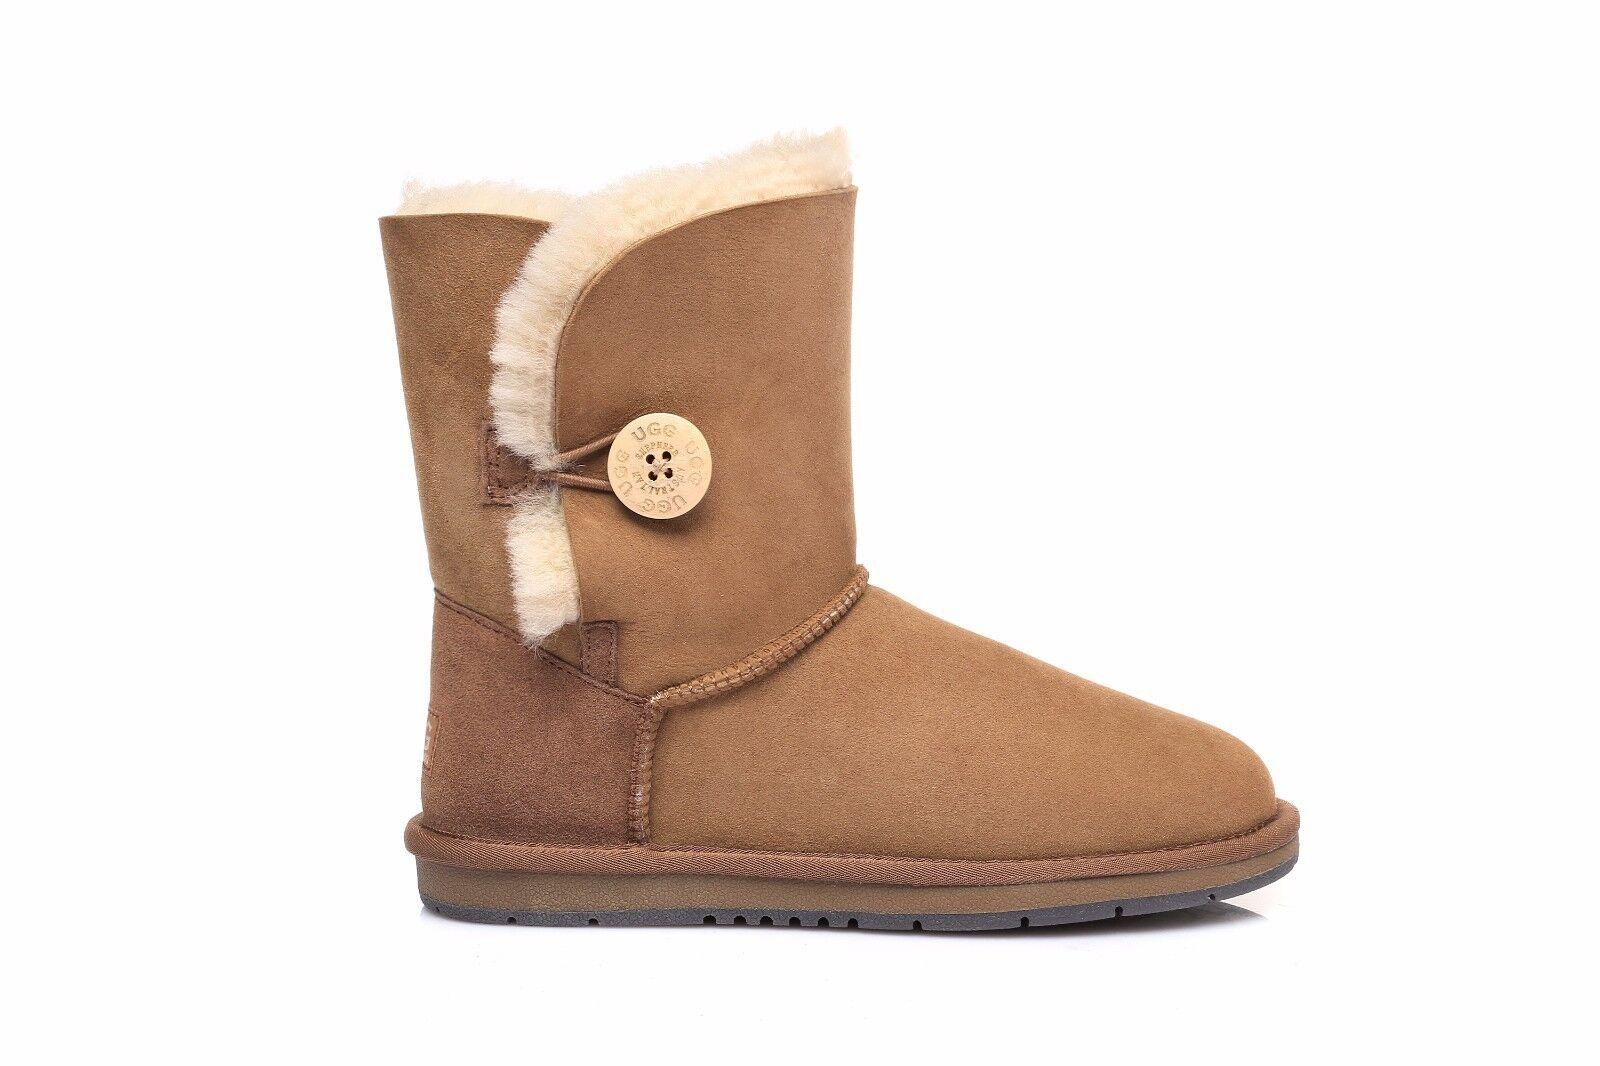 6f8d06dc67e Details about UGG Women Short Classic Button Boots -Australian Premium  Sheepskin Wool Non-Slip